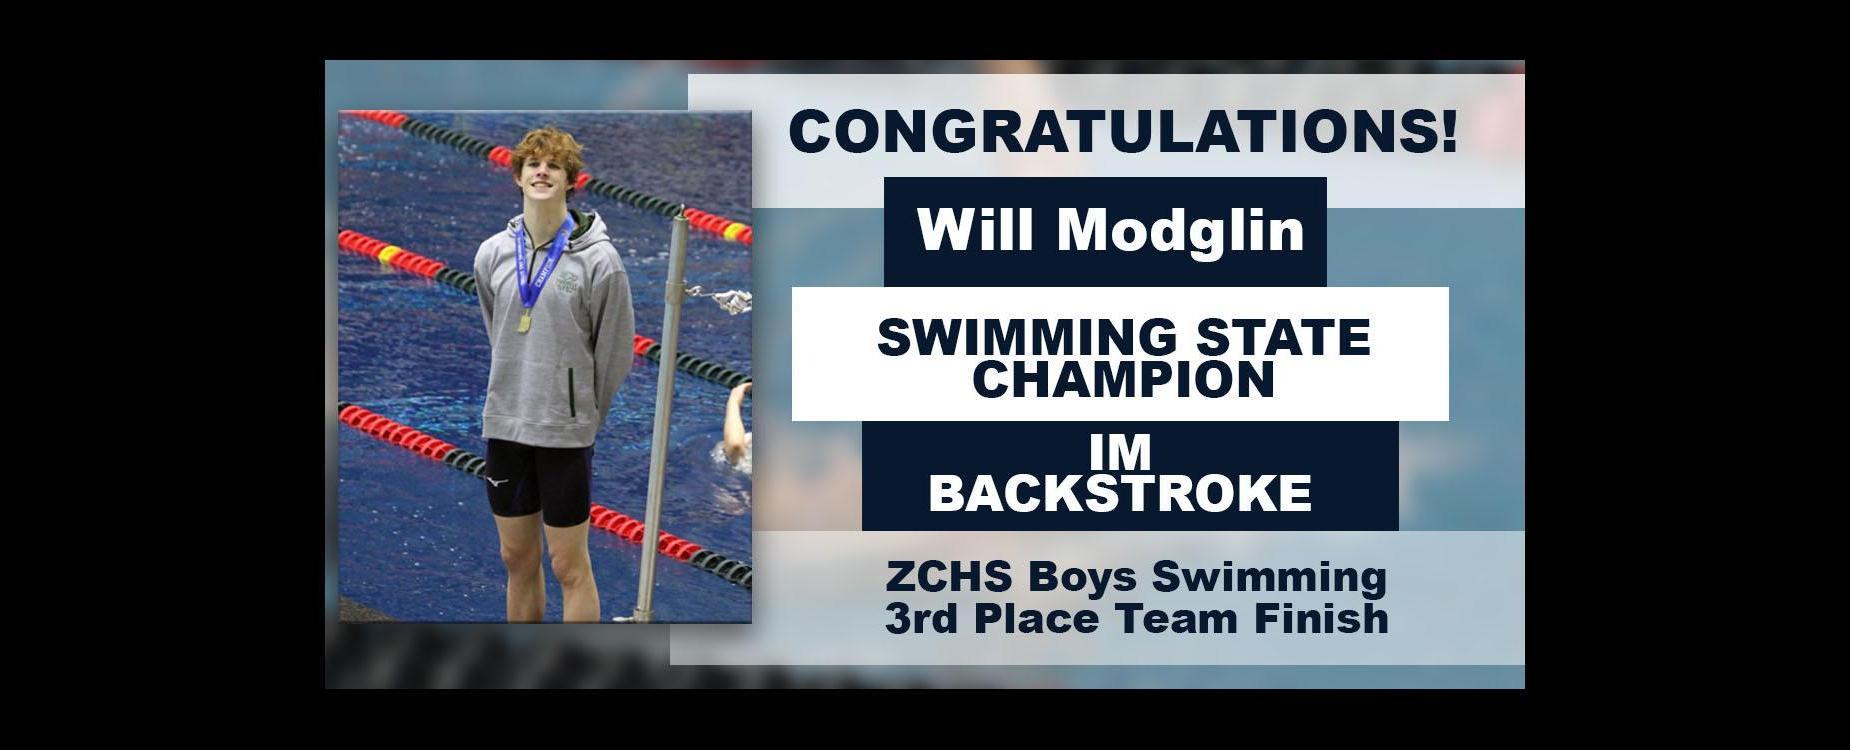 swimming state champ